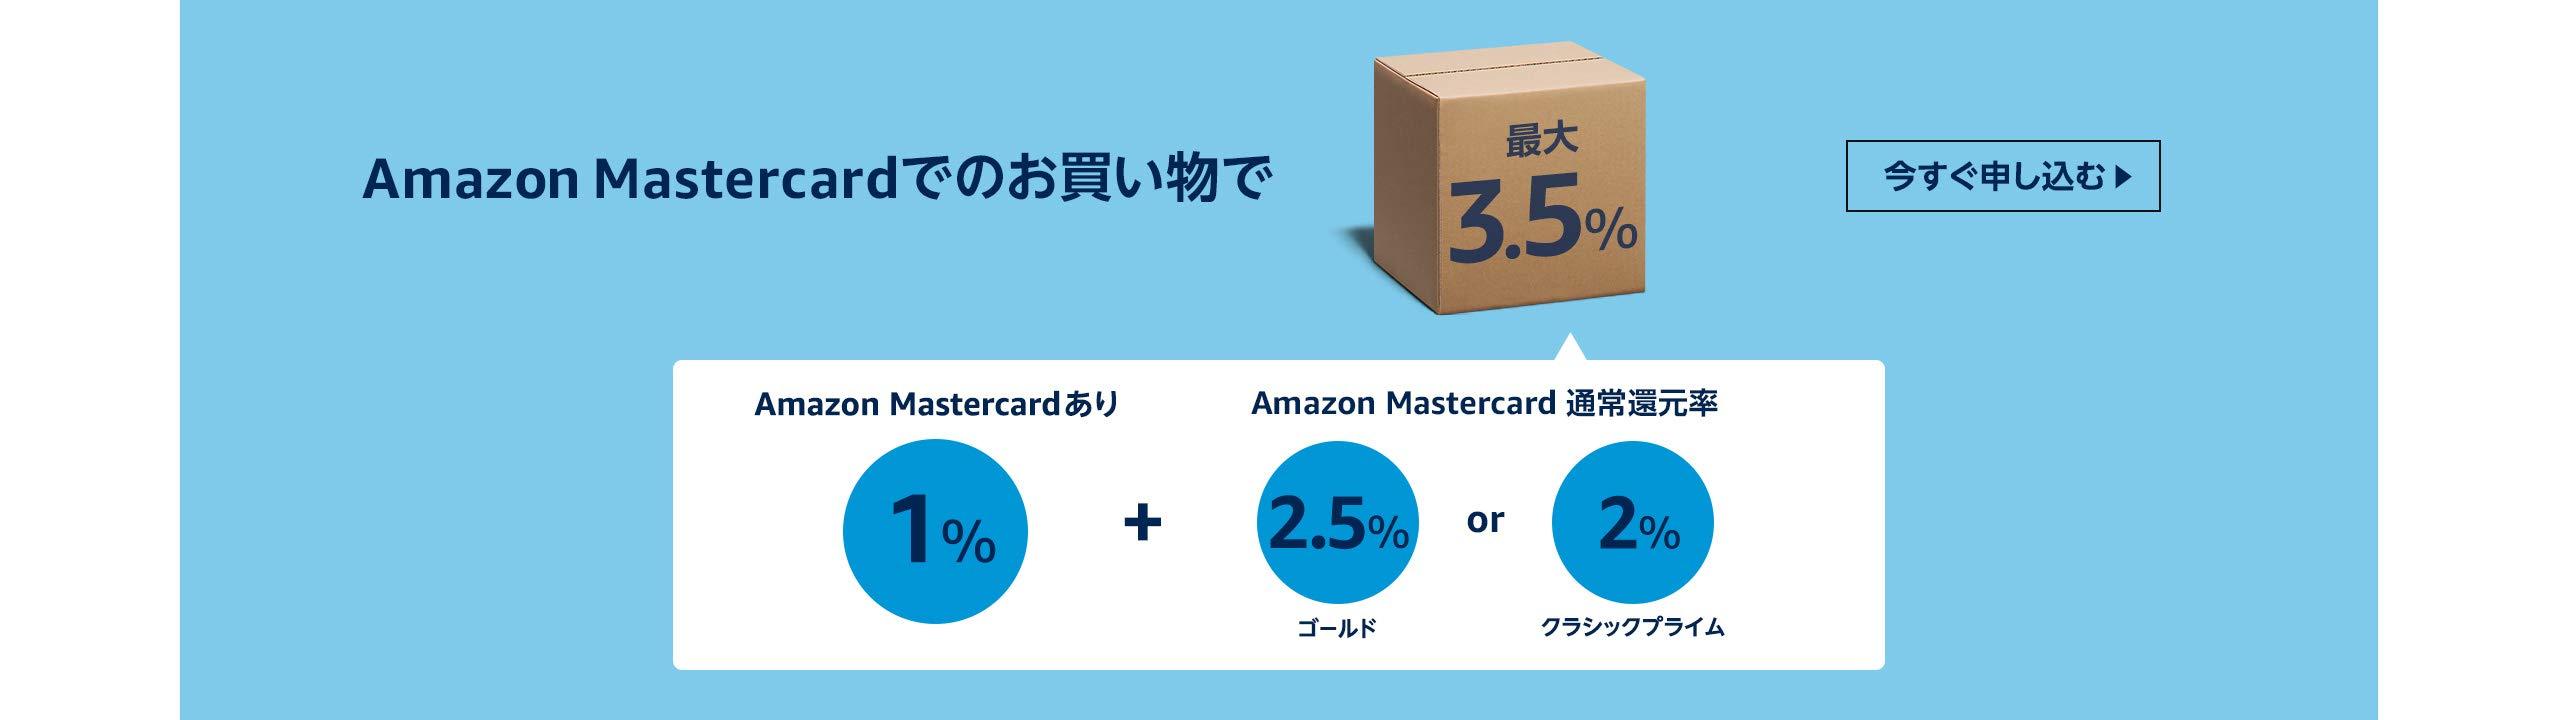 Amazon Mastercardに申し込む